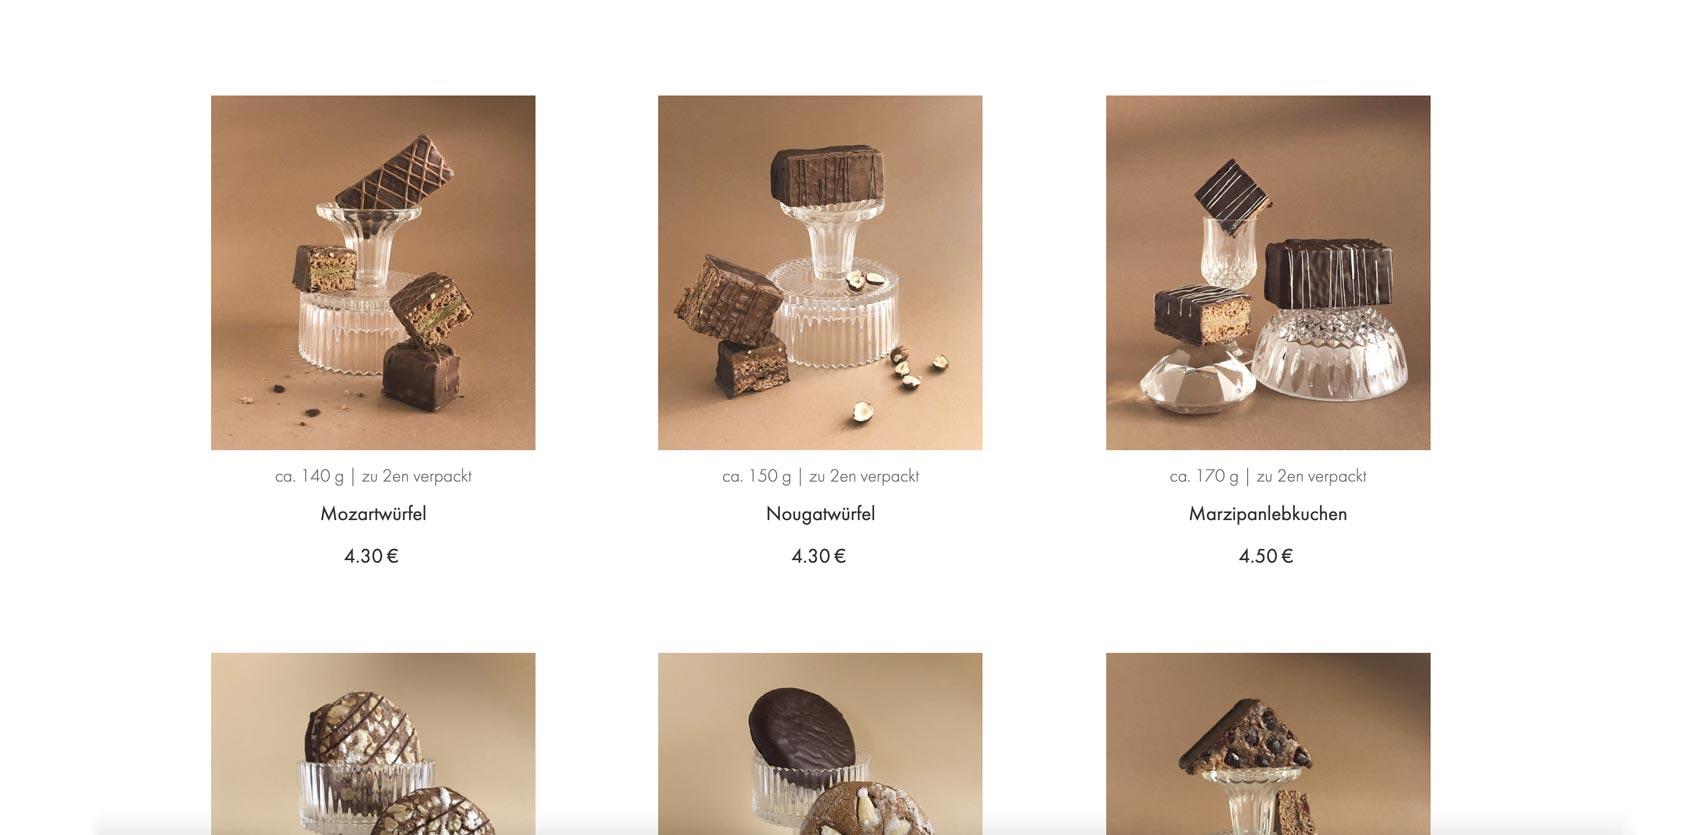 Website and webshop design for a cafe in Austria by Alexandra Linortner